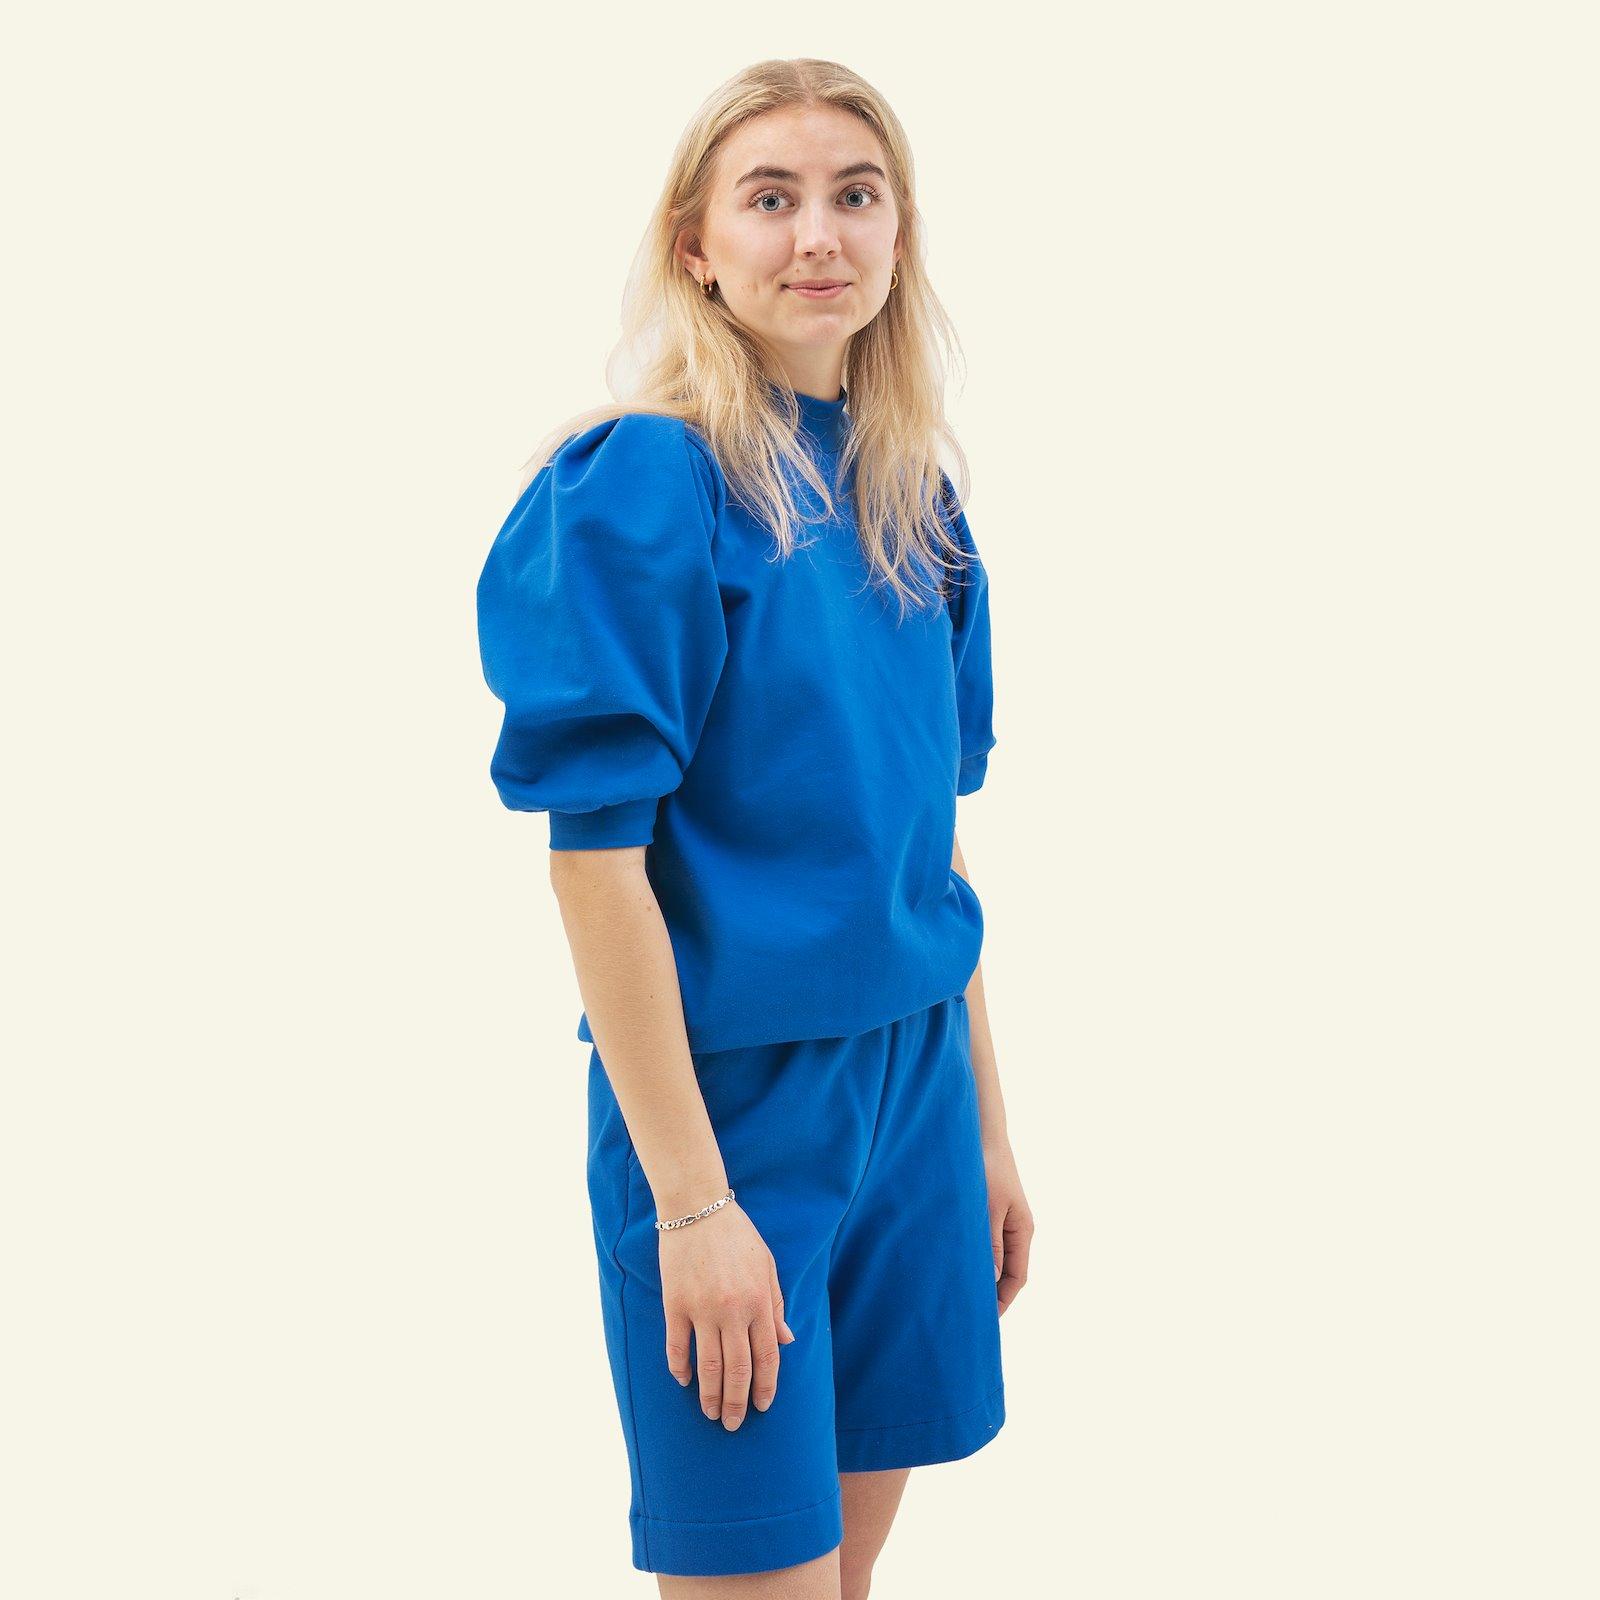 Organic french terry cobalt blue brushed p22074_211744_230604_p20051_bundle